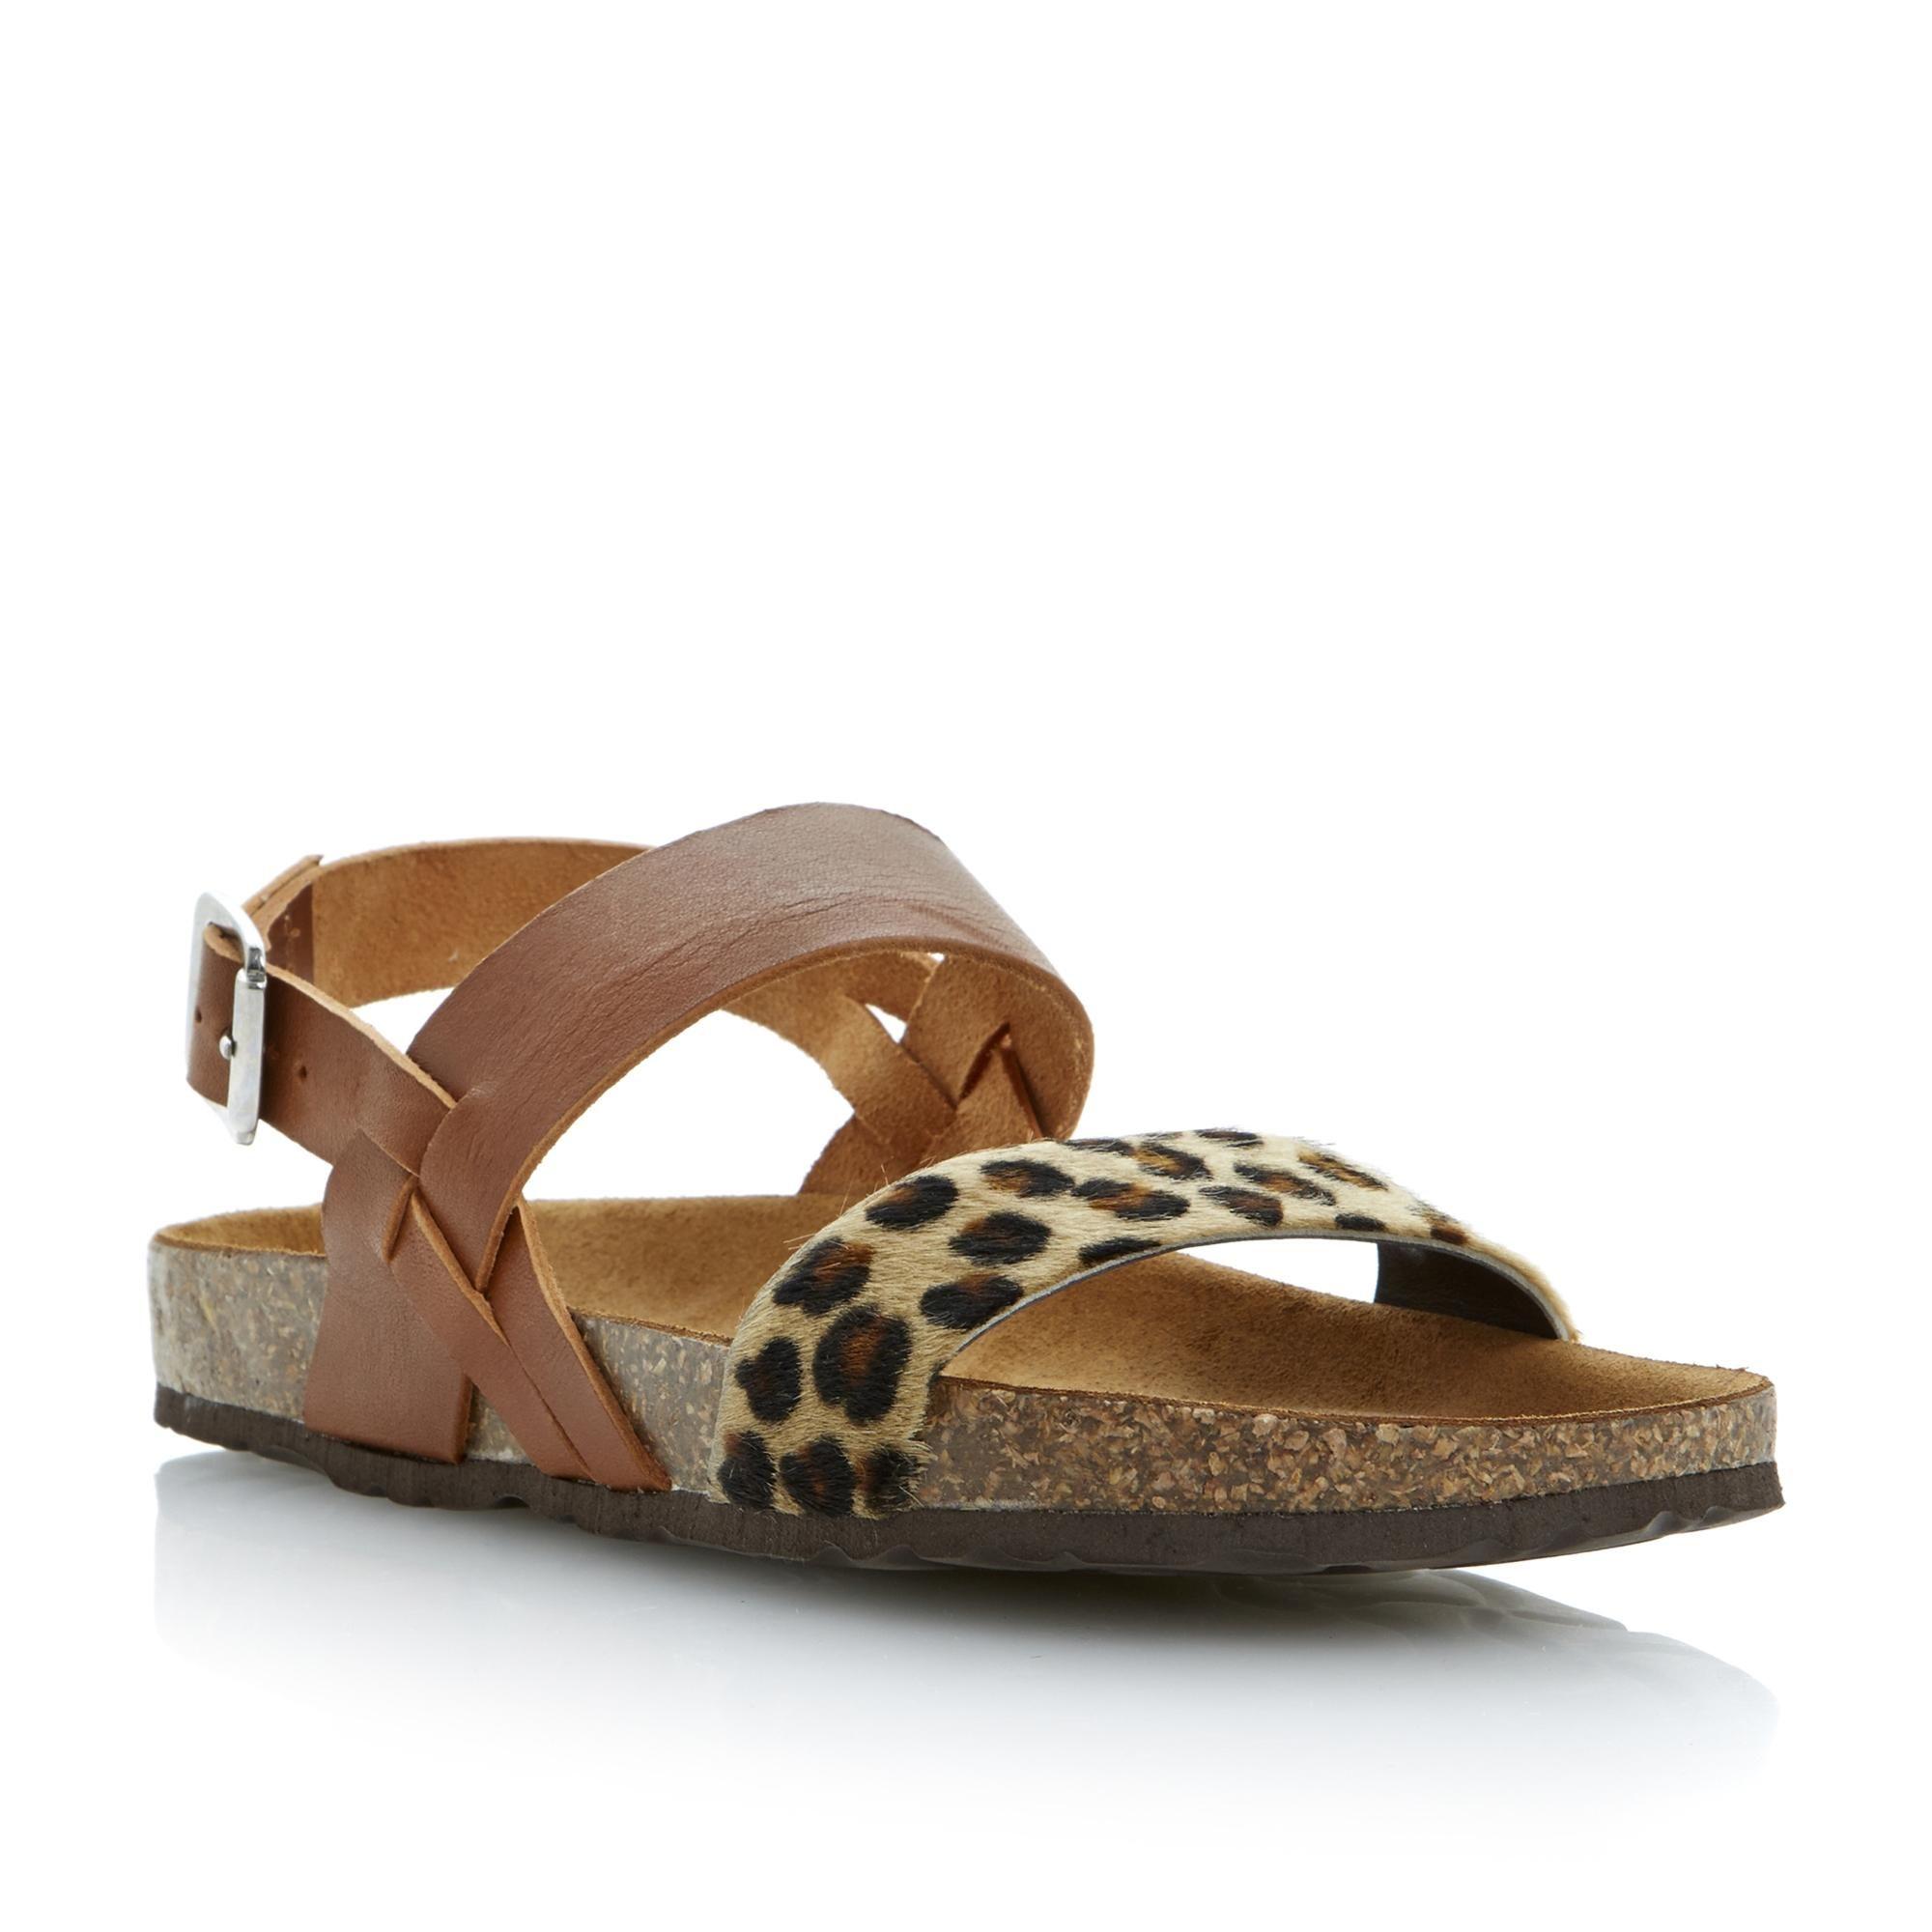 Leather sandals flat, Sandals